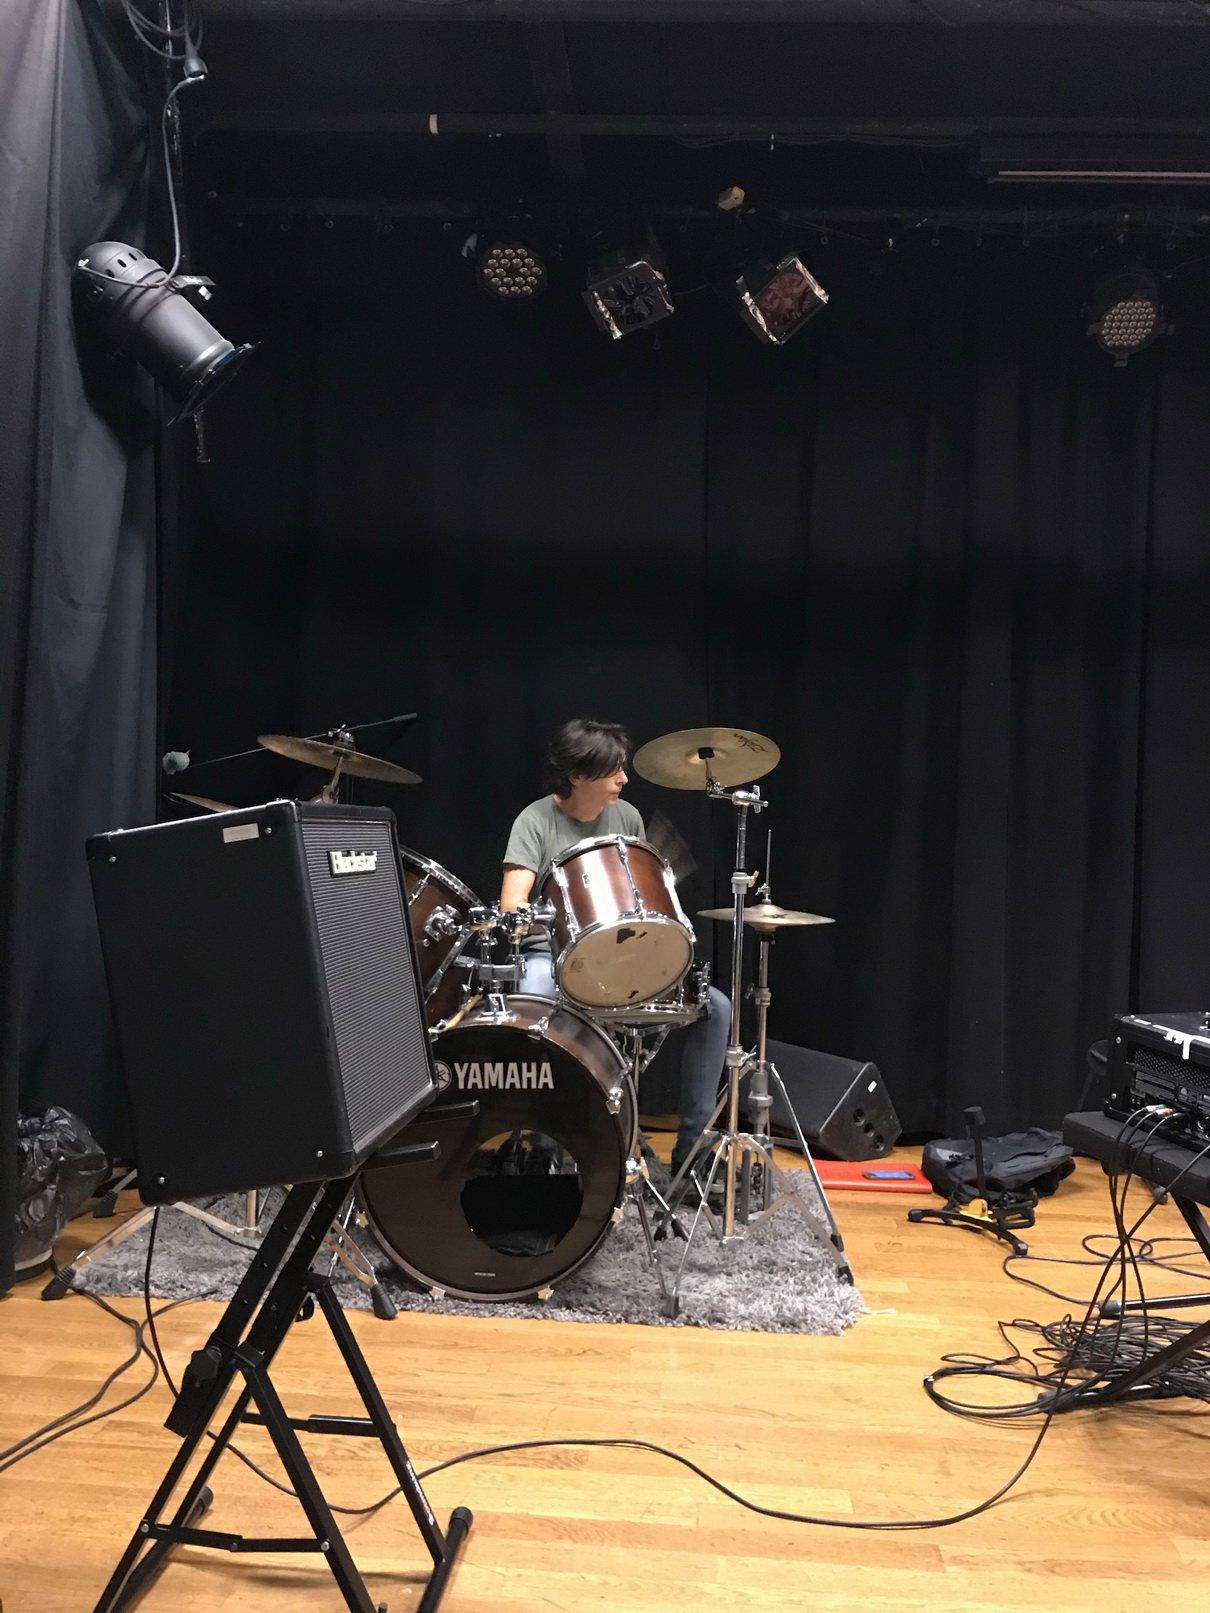 Annyvonne on drums